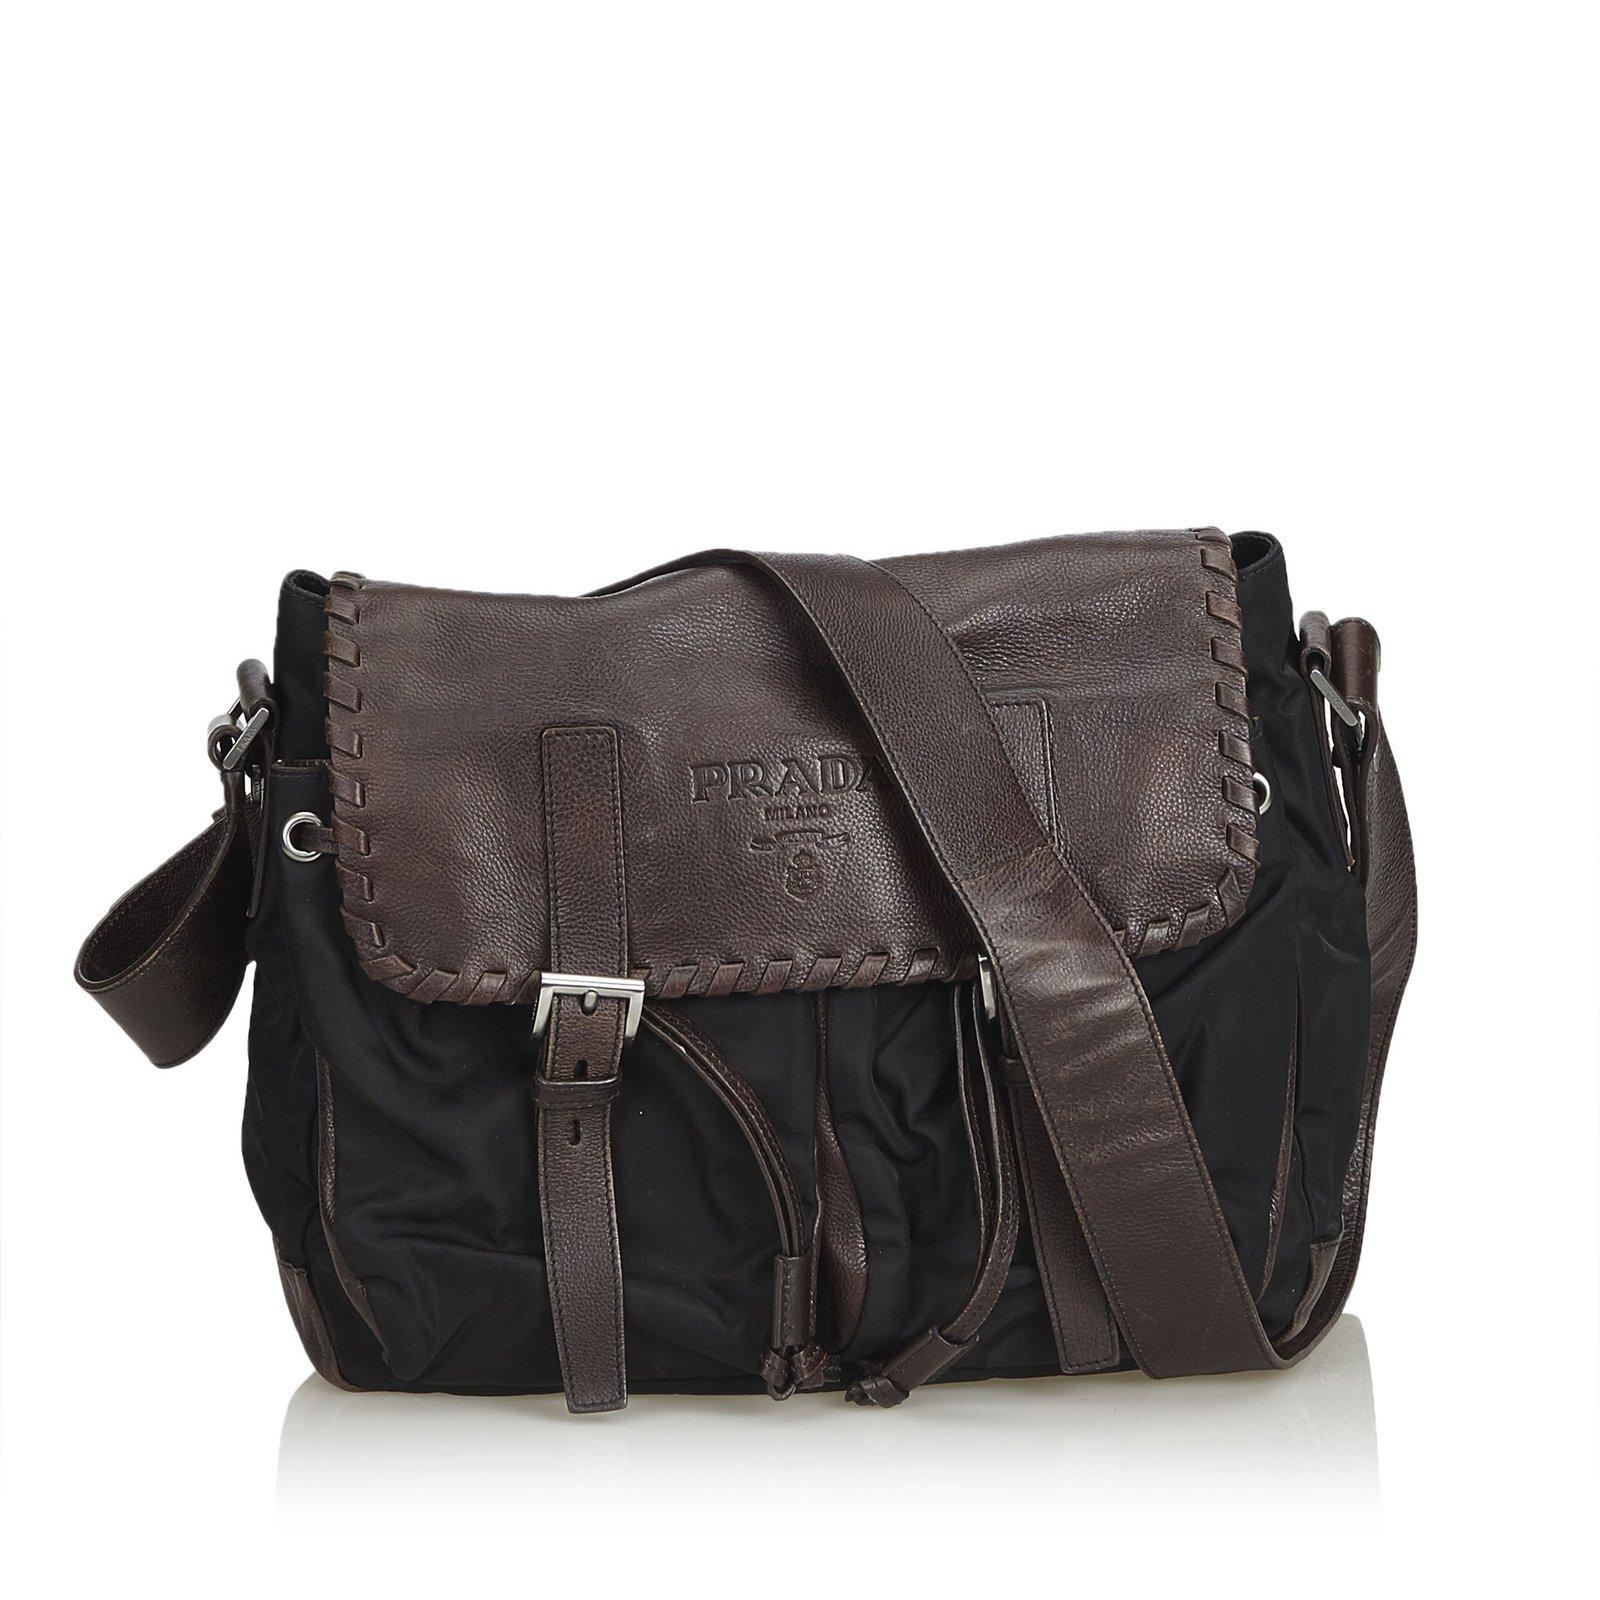 77bd305c0e83 Prada Nylon Messenger Bag Handbags Leather,Other,Nylon,Cloth Brown,Black,